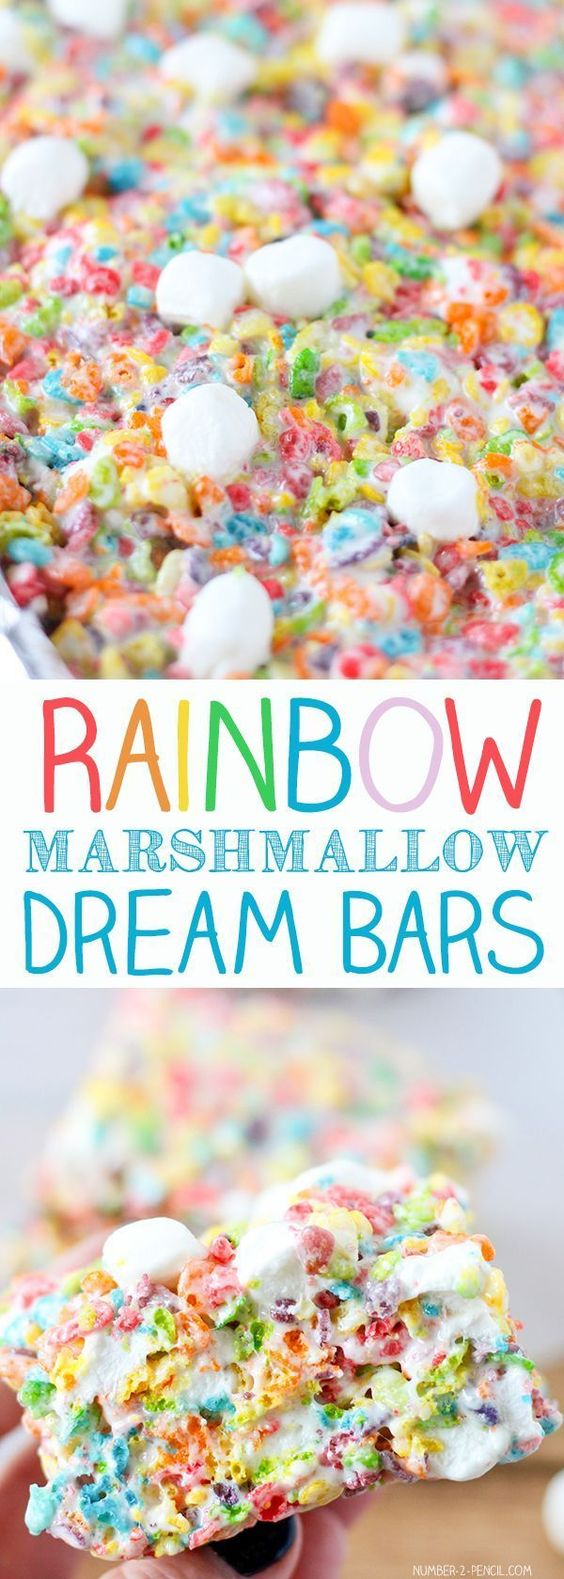 RAINBOW MARSHMALLOW DREAM BARS